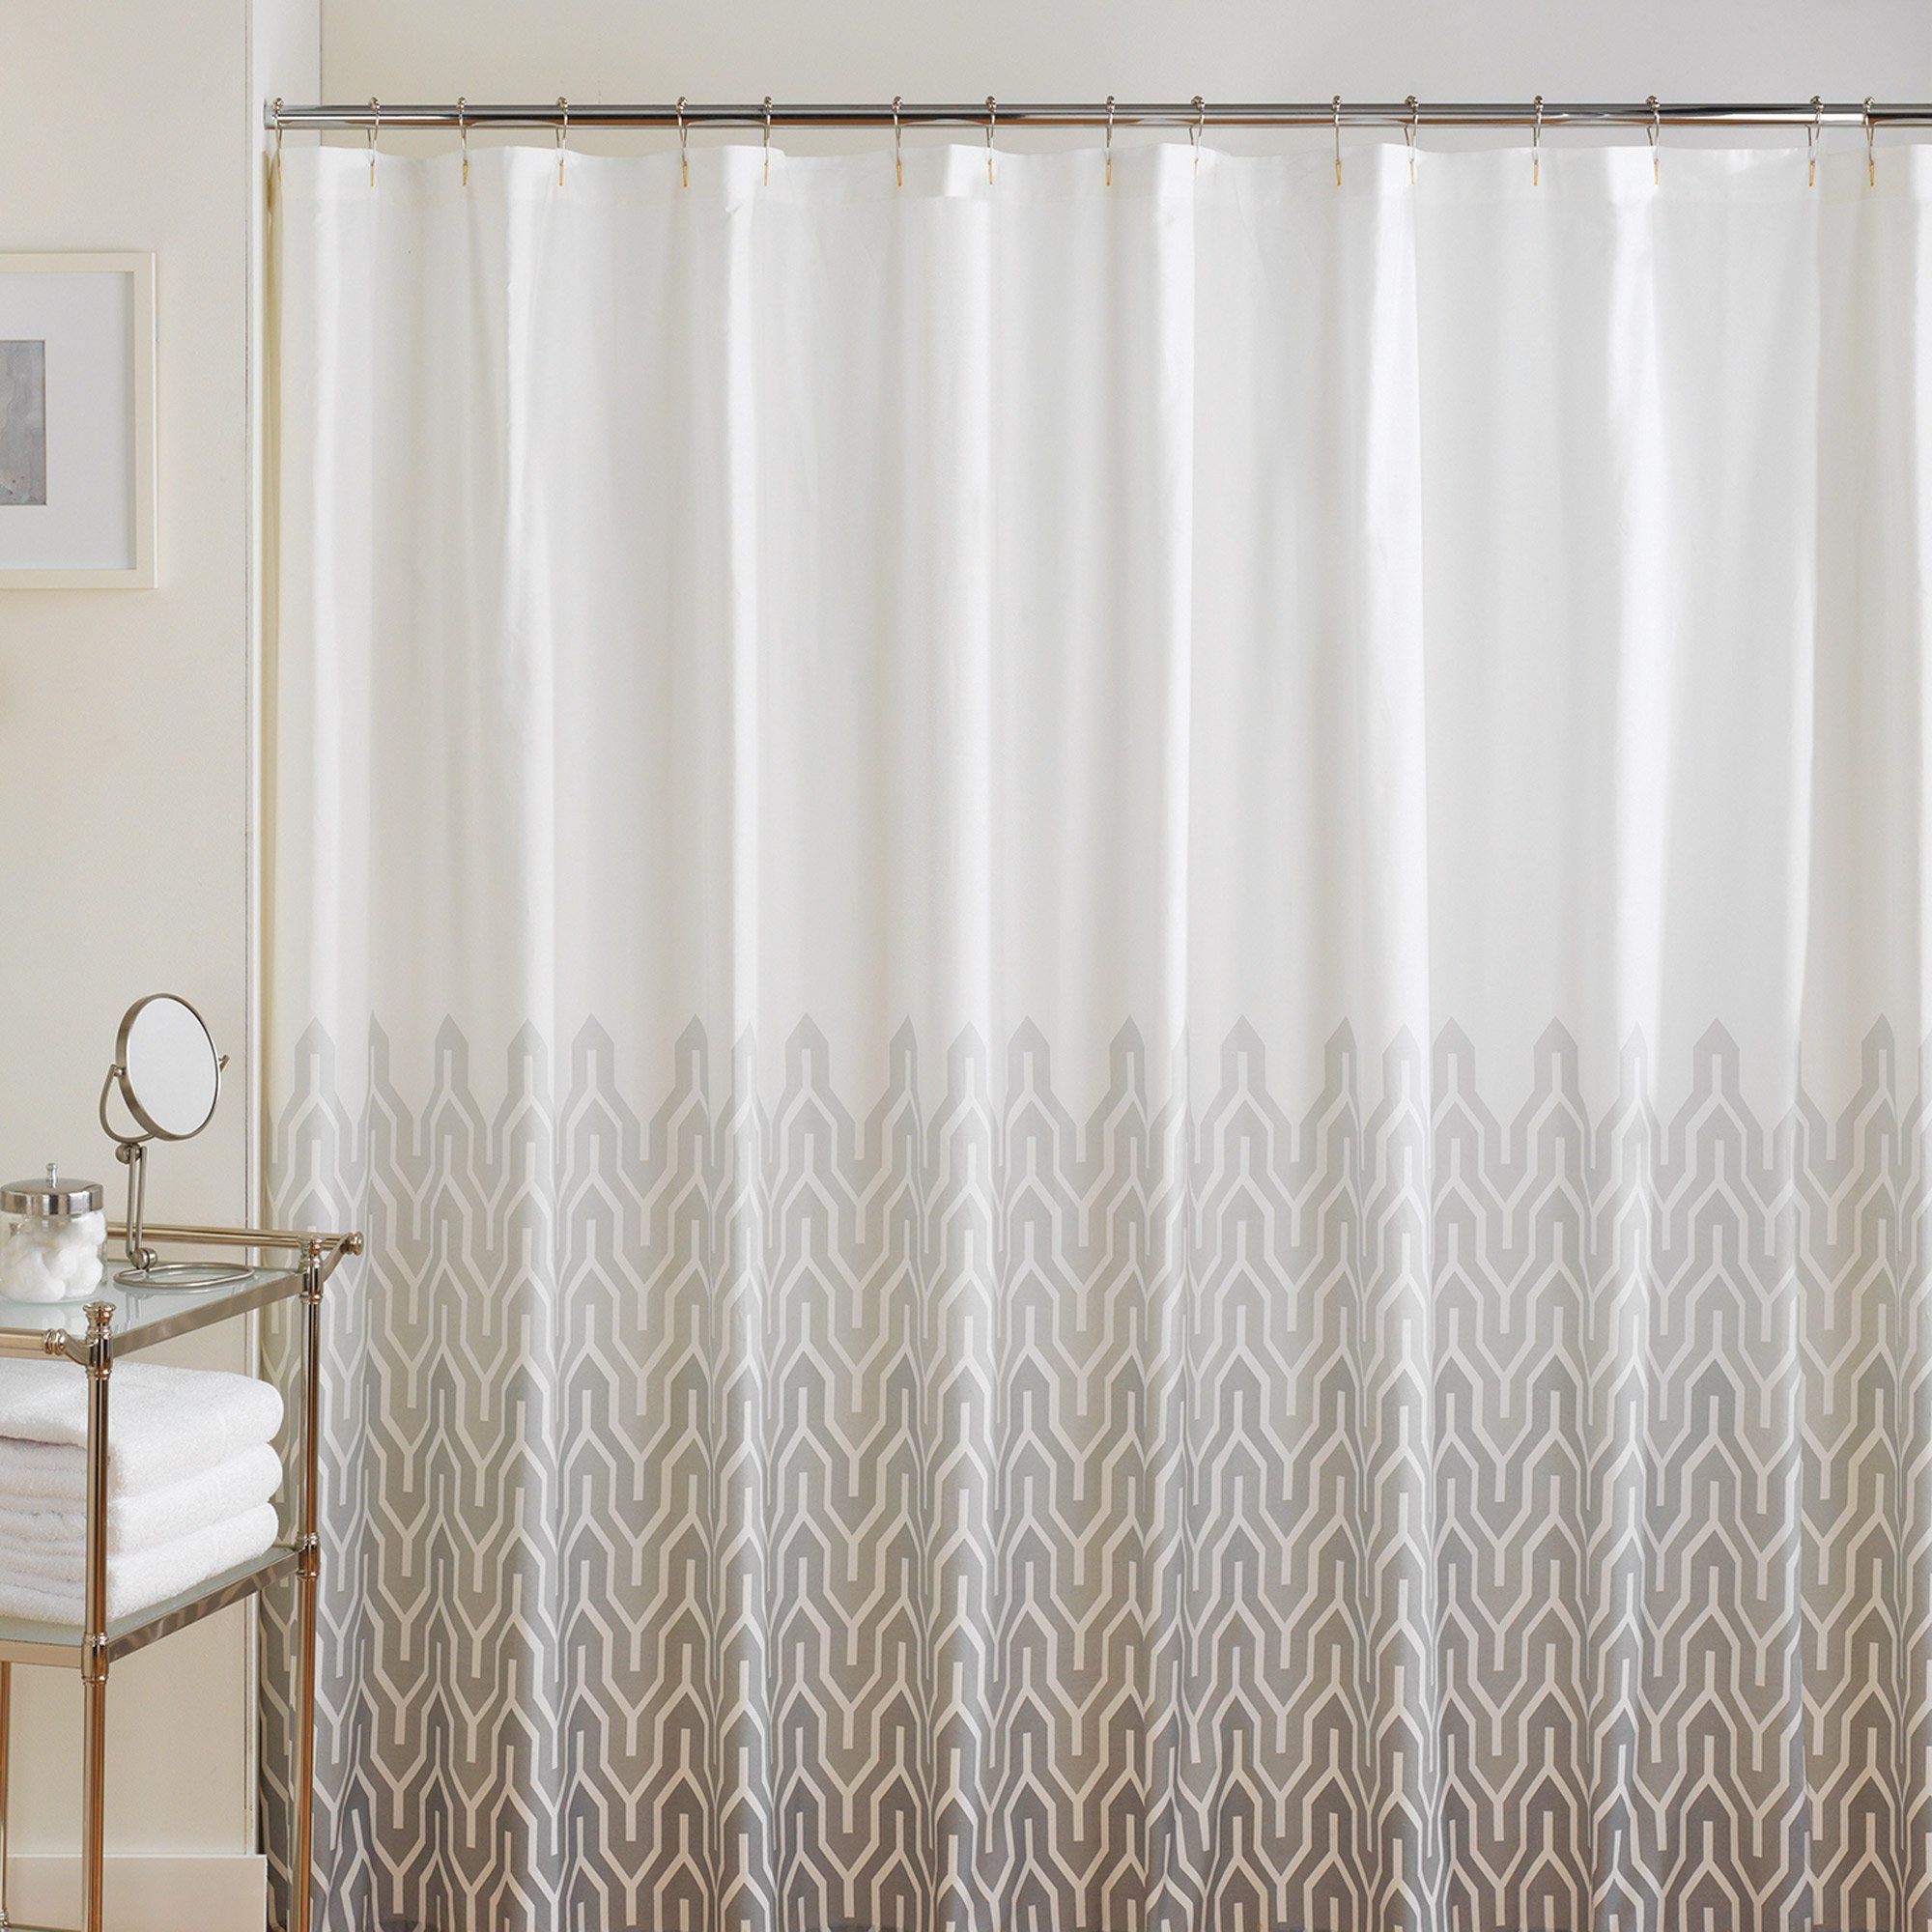 Jill rosenwald plimpton flame shower curtain pearl decor